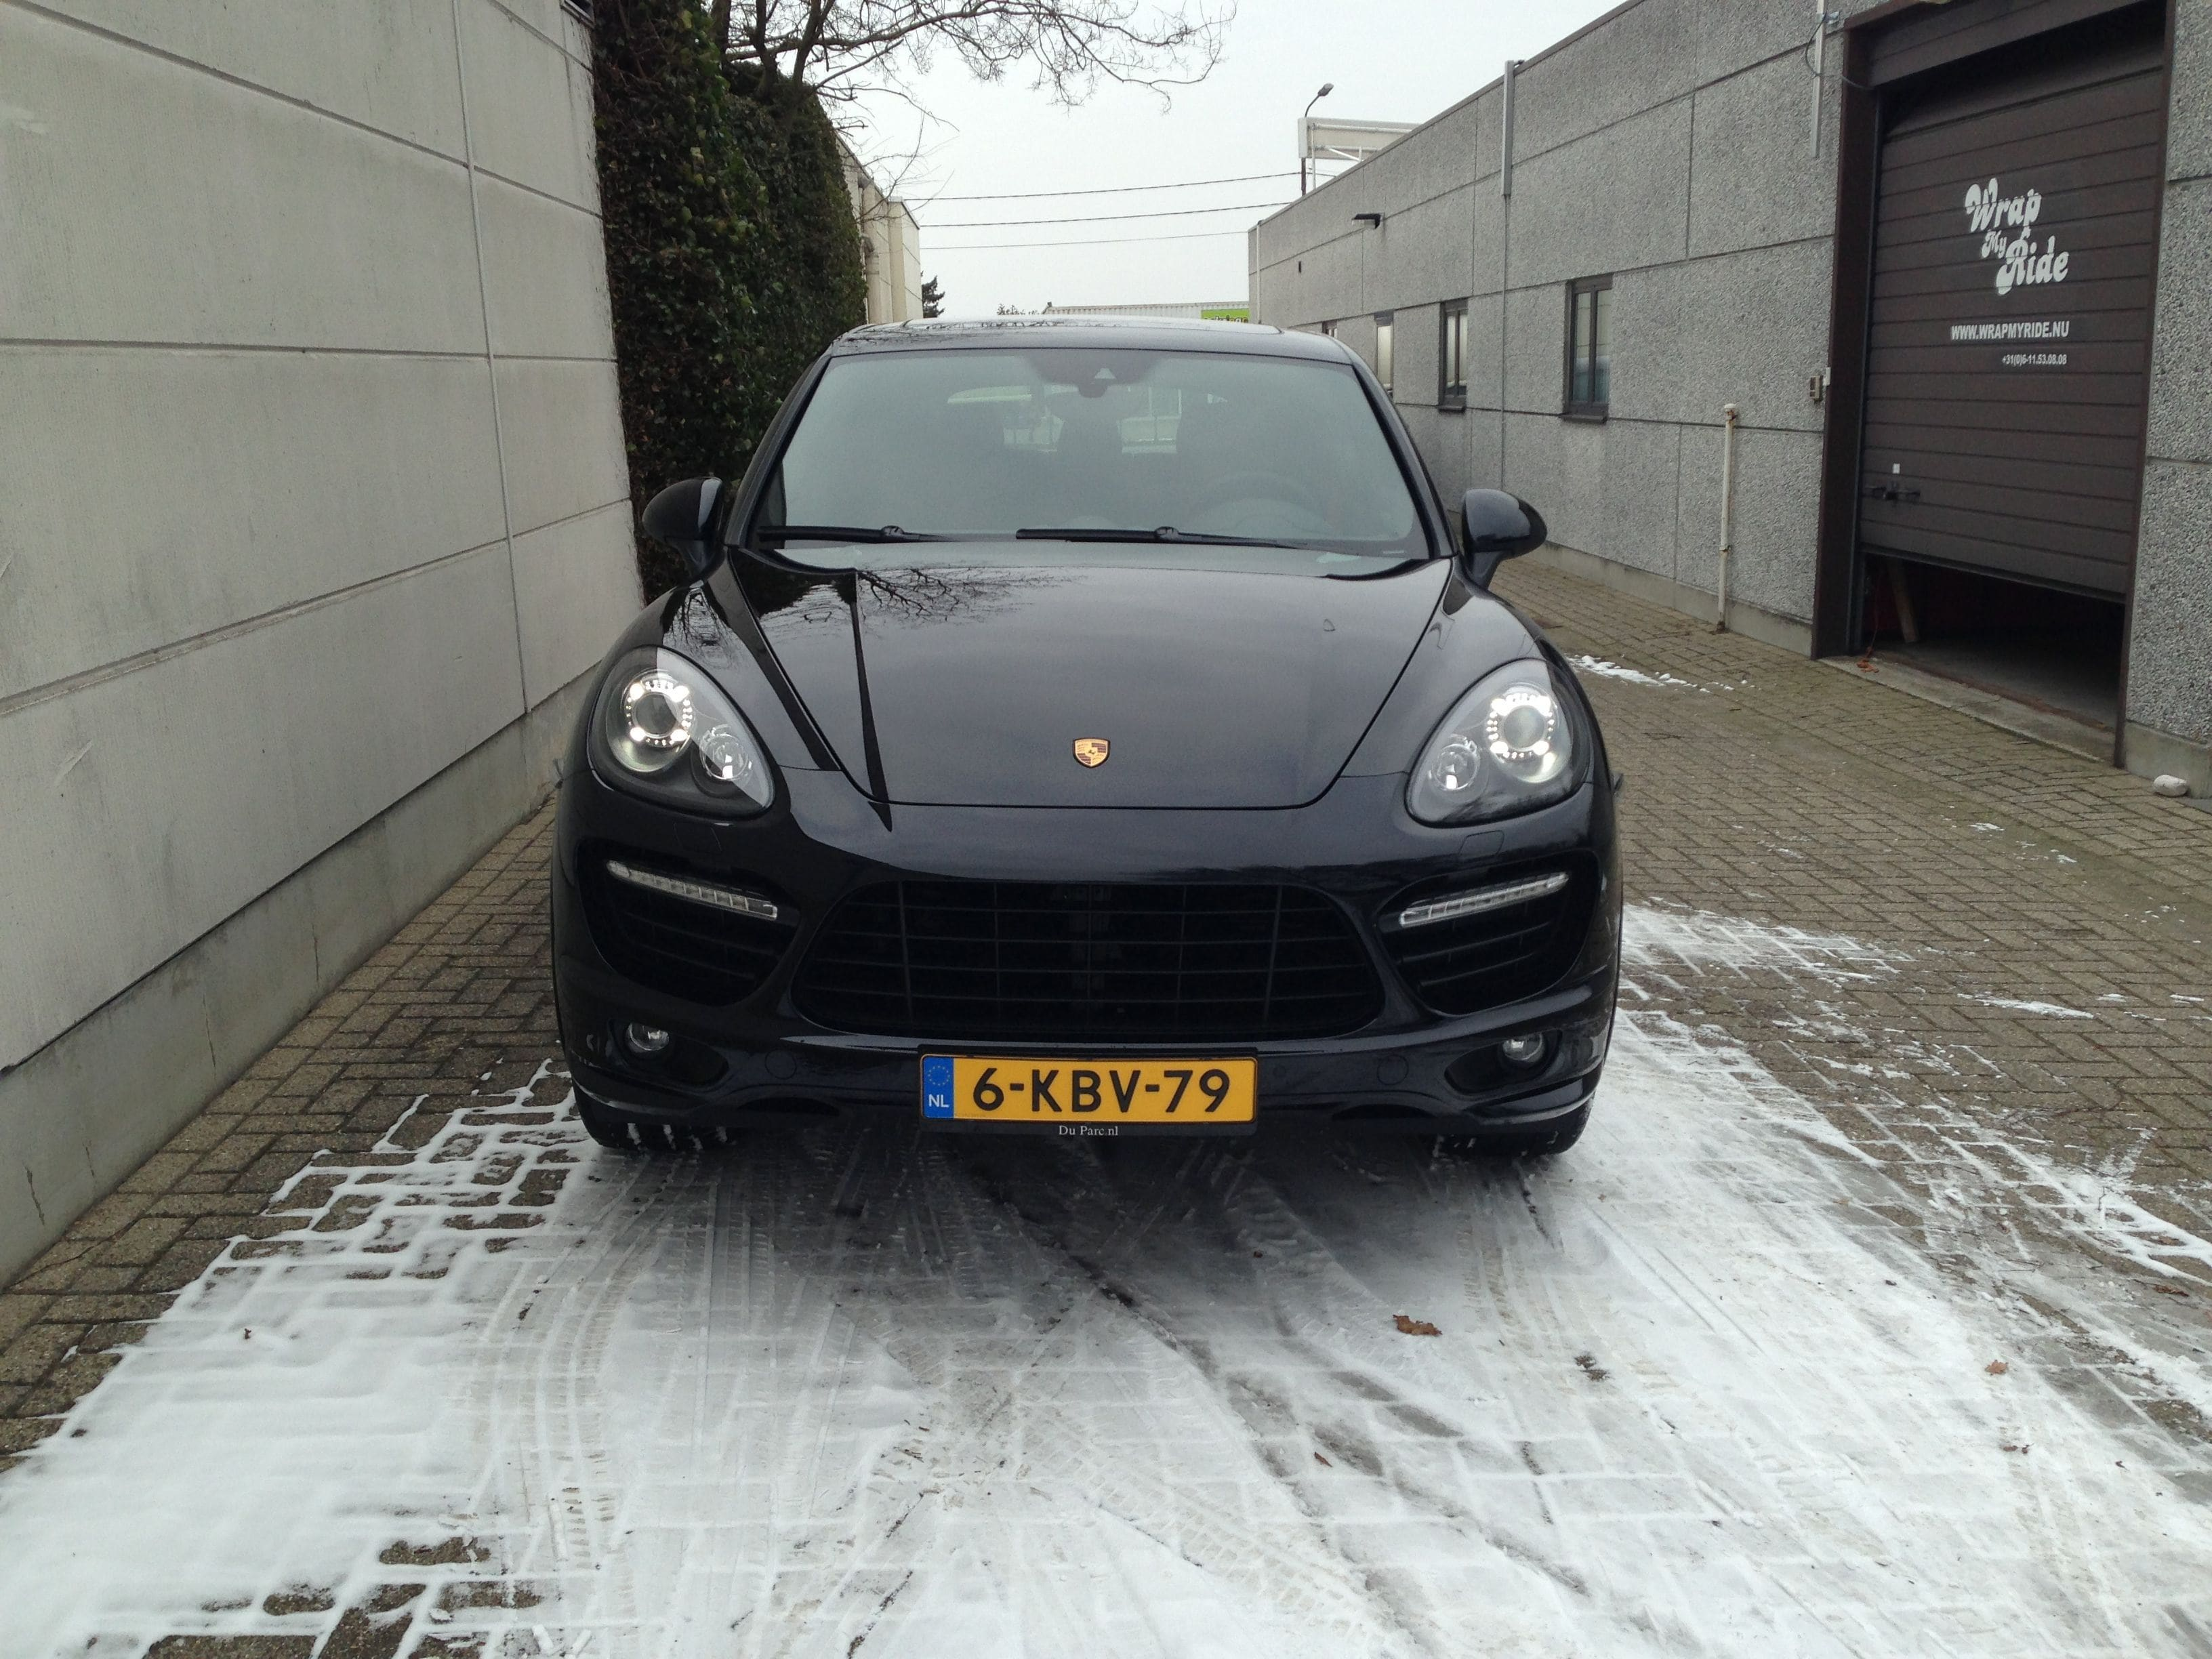 Porsche Cayenne GTS met Gunpowder Wrap, Carwrapping door Wrapmyride.nu Foto-nr:6759, ©2020